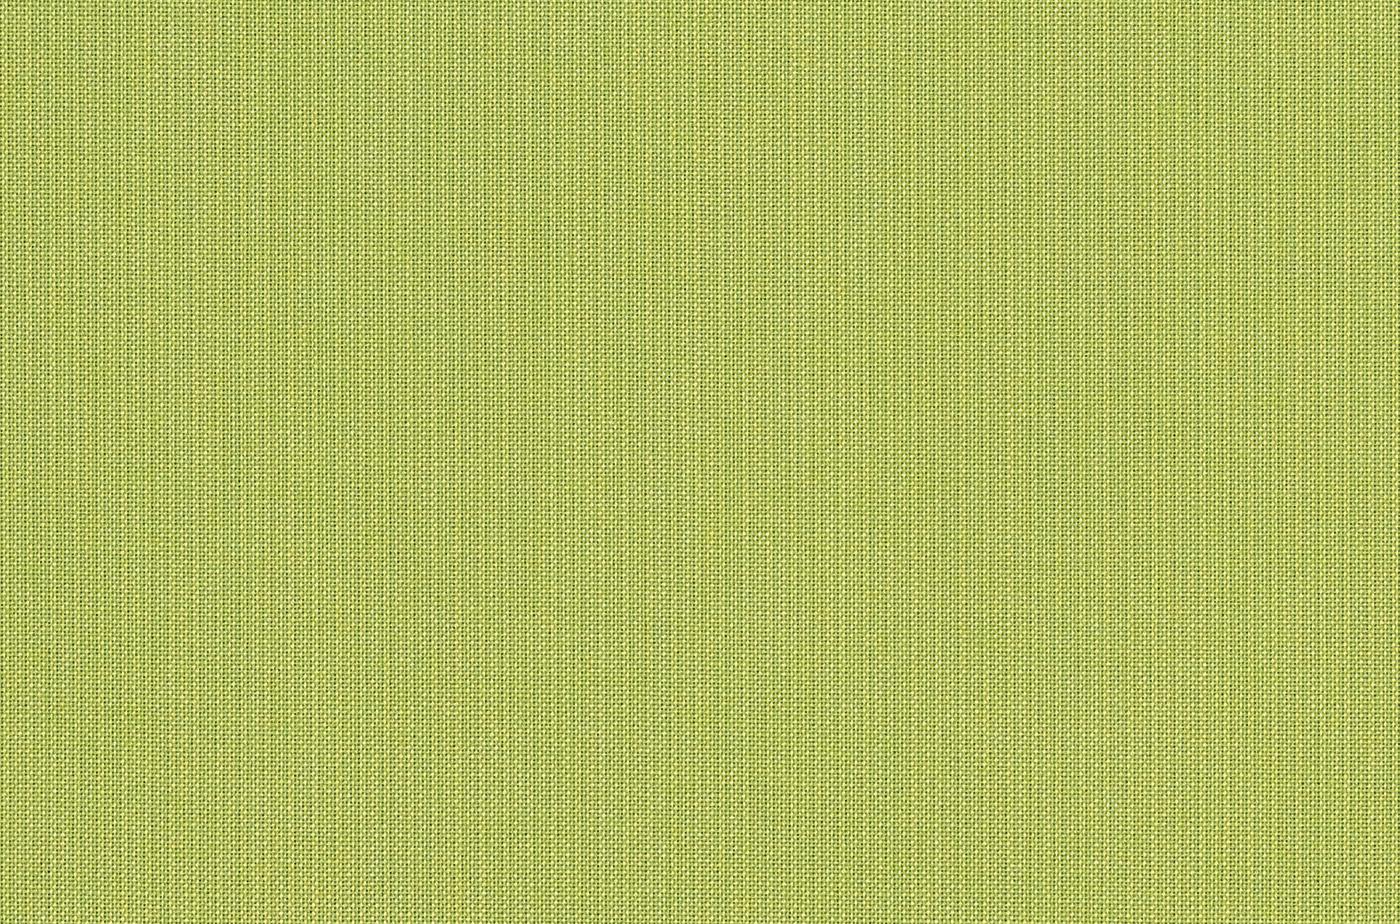 Spectrum Kiwi 48023 0000